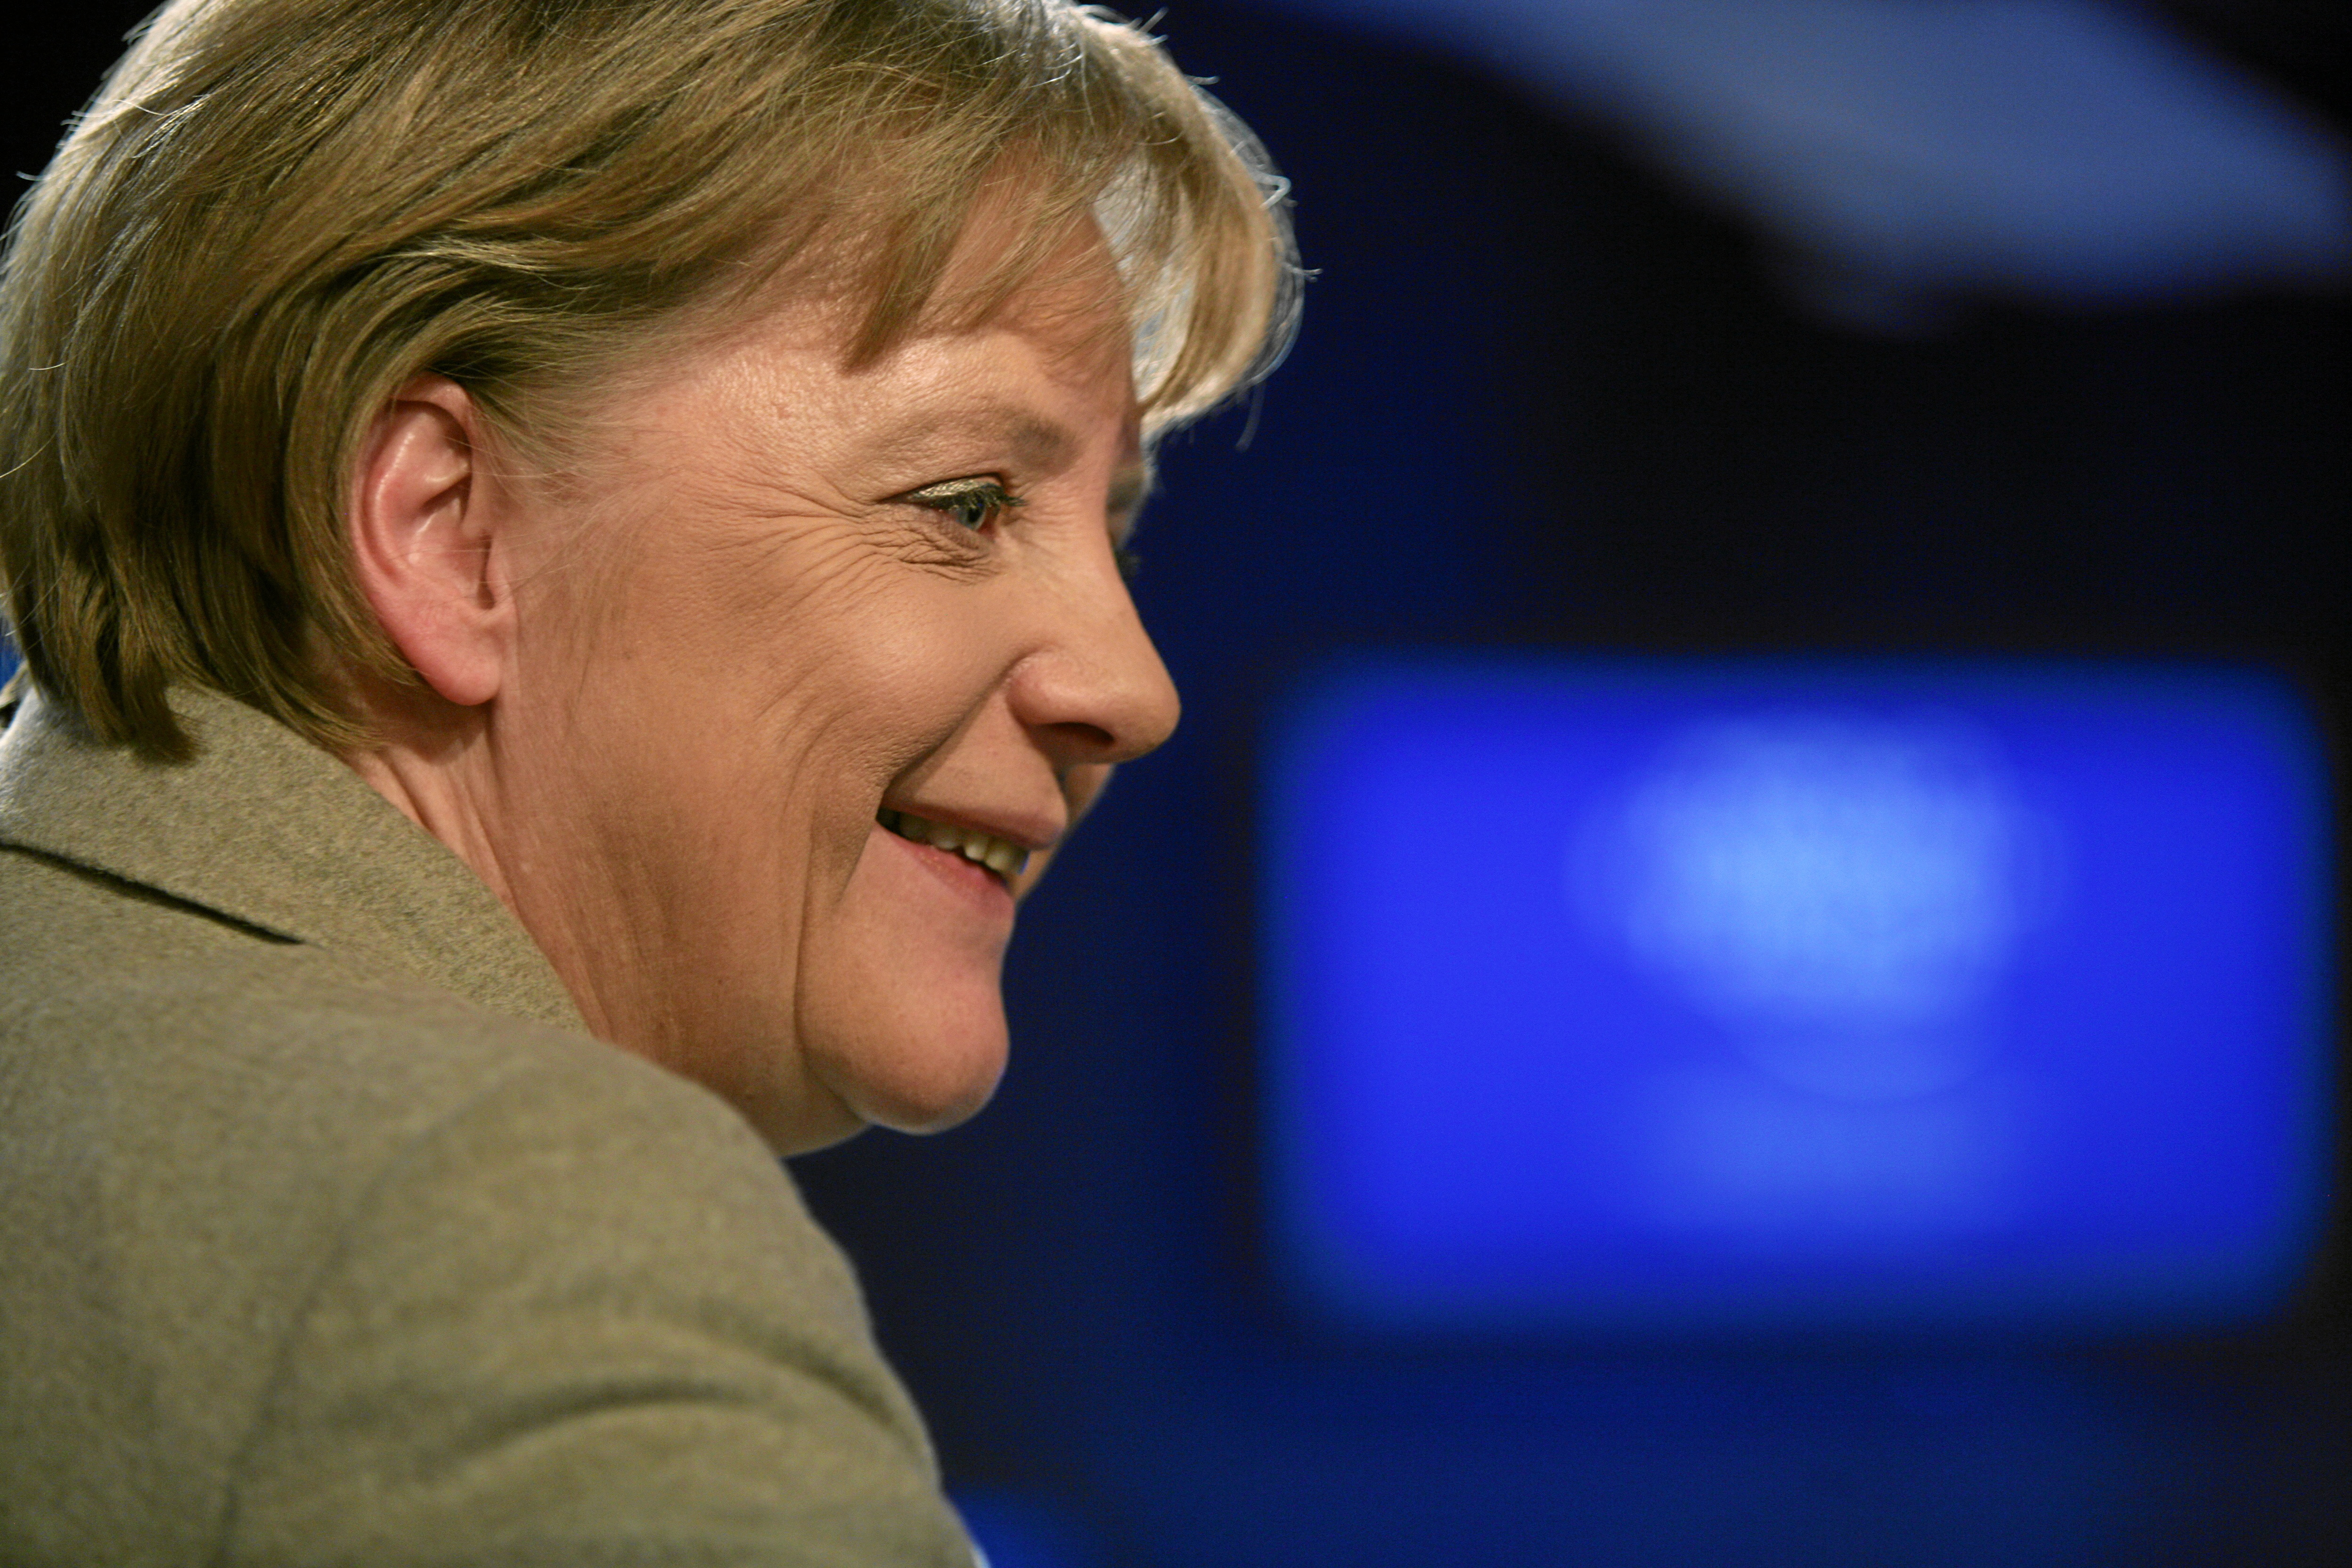 Merkel's Right?